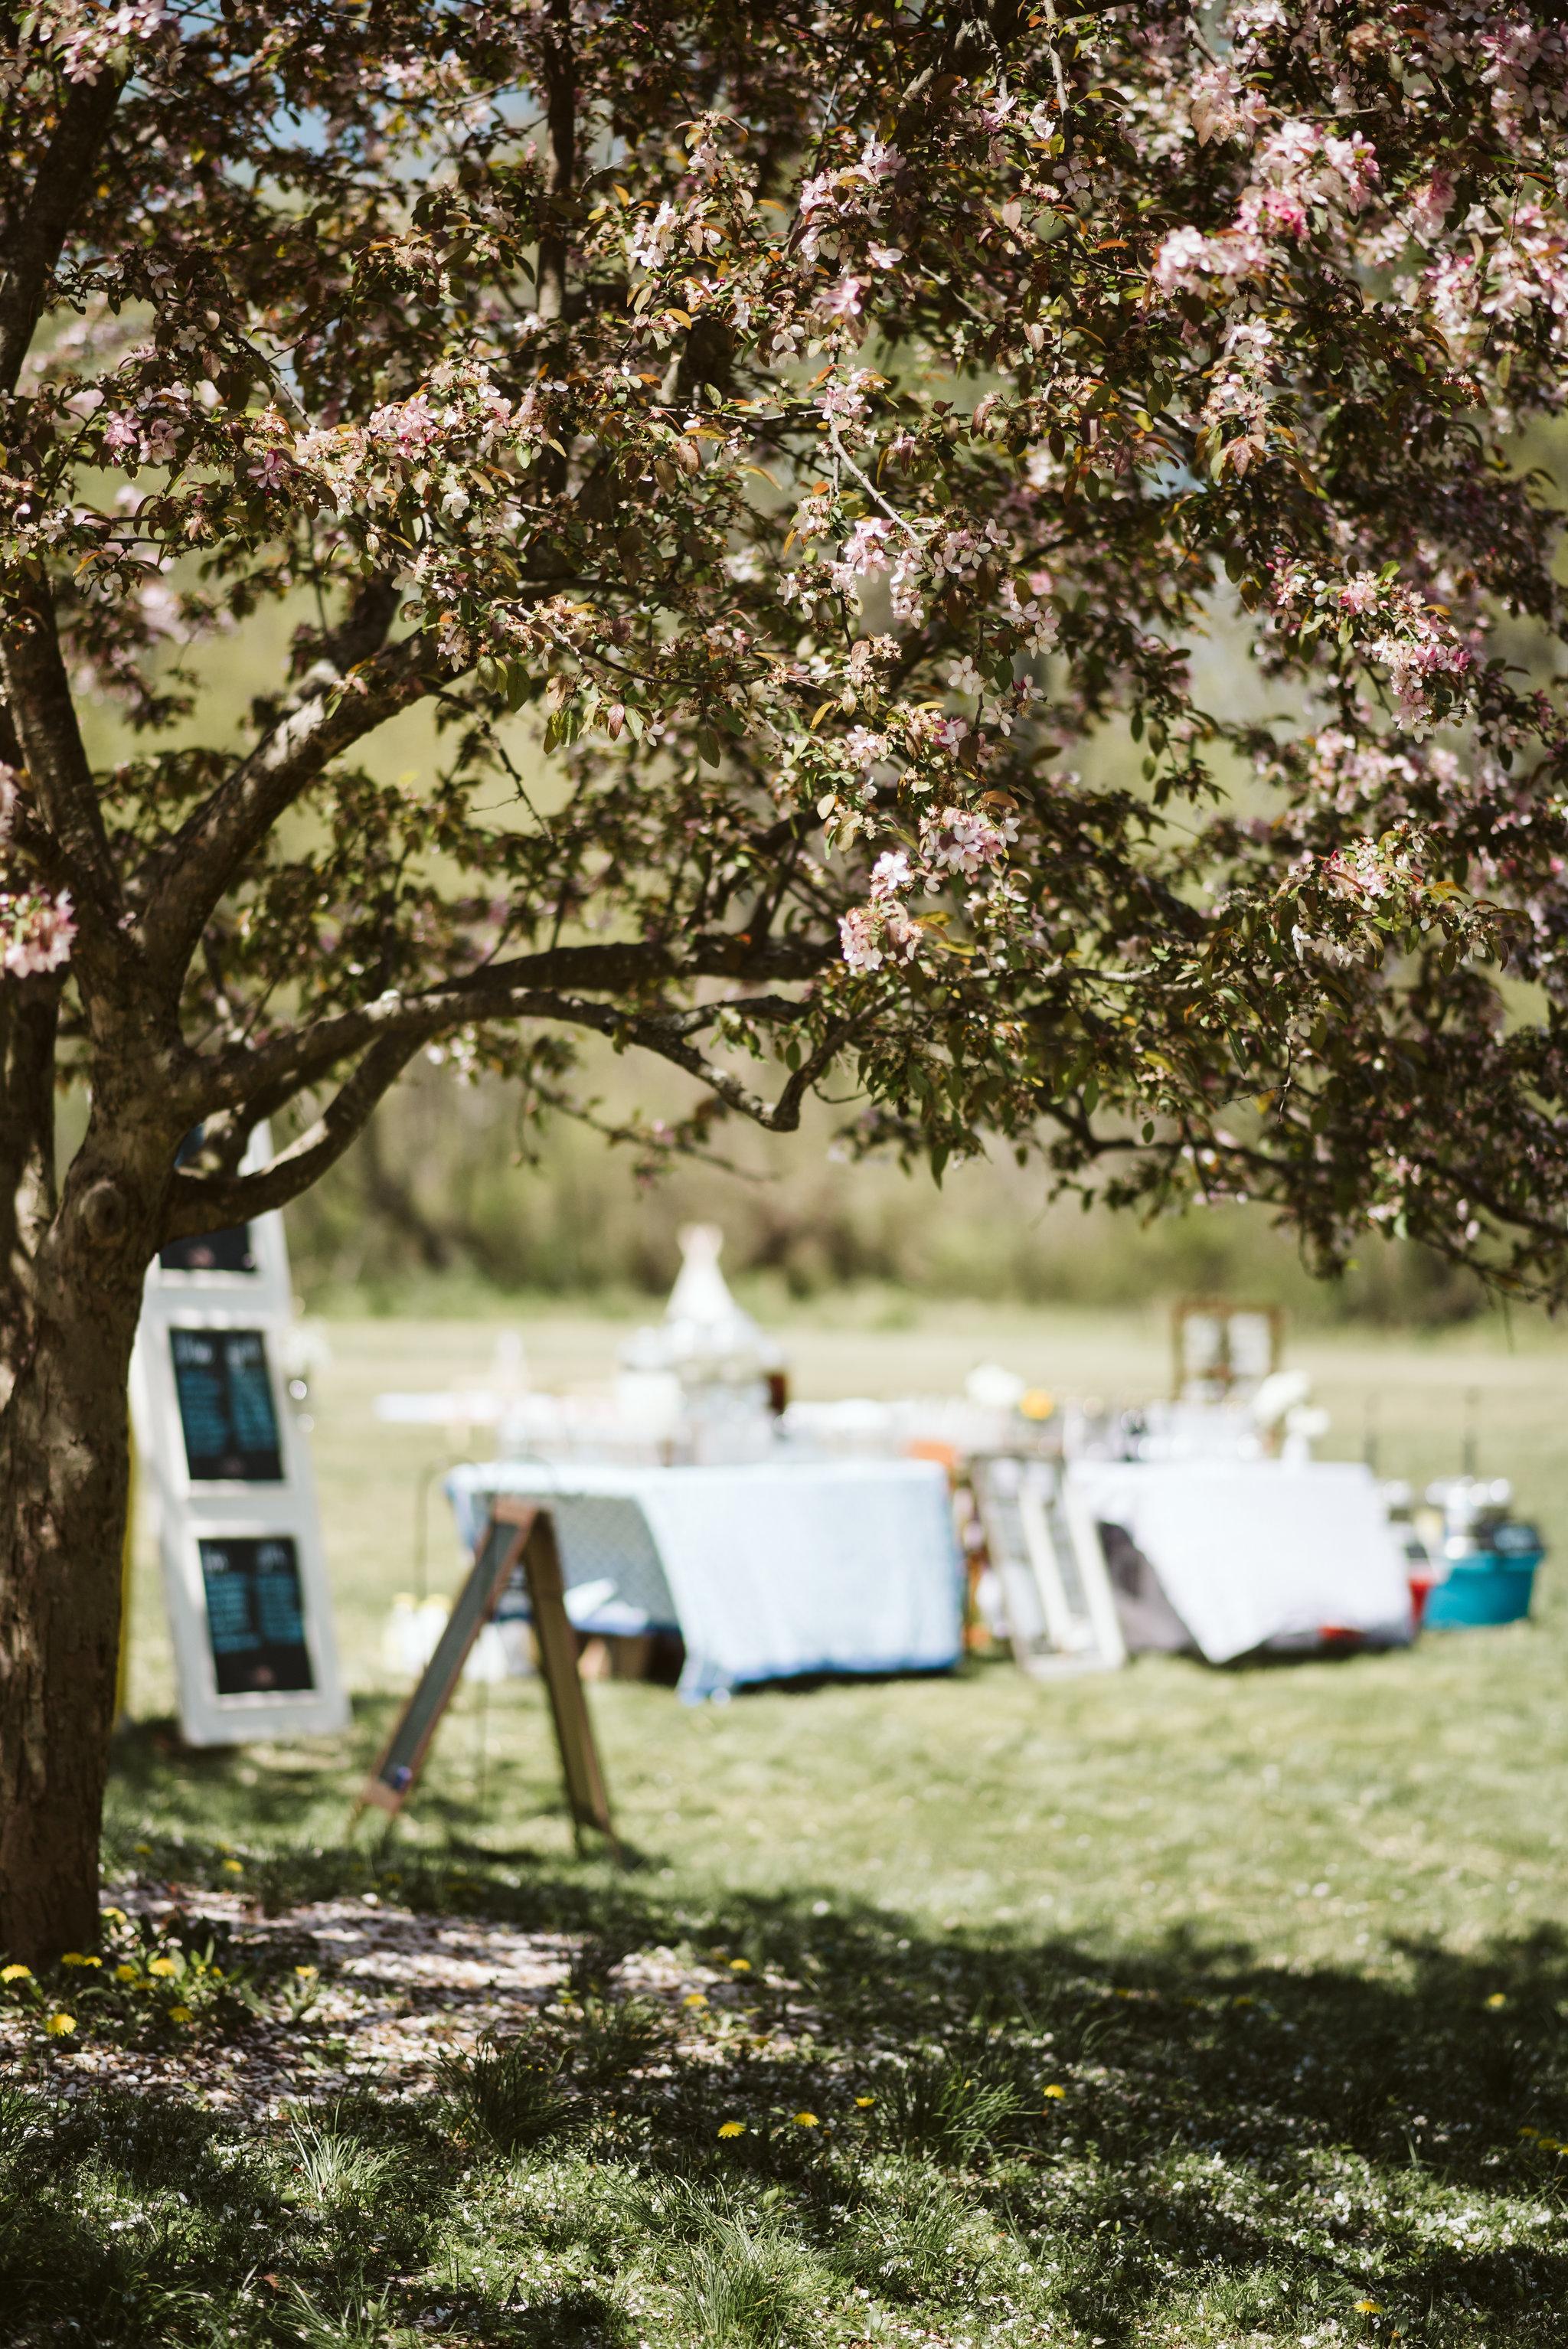 Spring Outdoor Wedding, Park, Baltimore Wedding Photographer, DIY, Classic, Upcycled, Garden Party, Romantic, Reception Decor, Homemade Bar and Signage